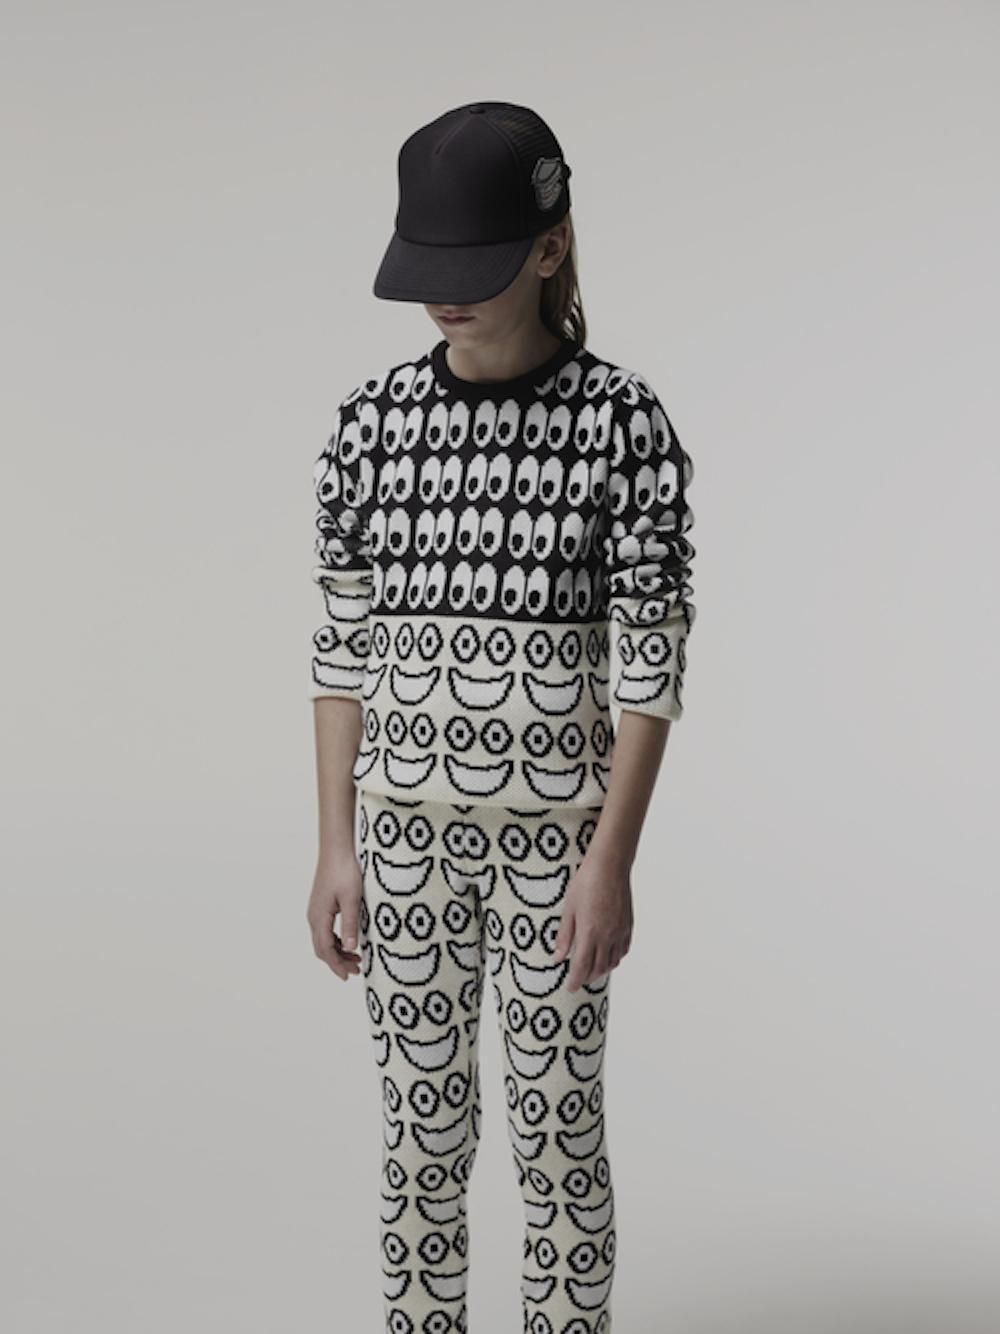 Caroline+Bosmans+SS15_knit